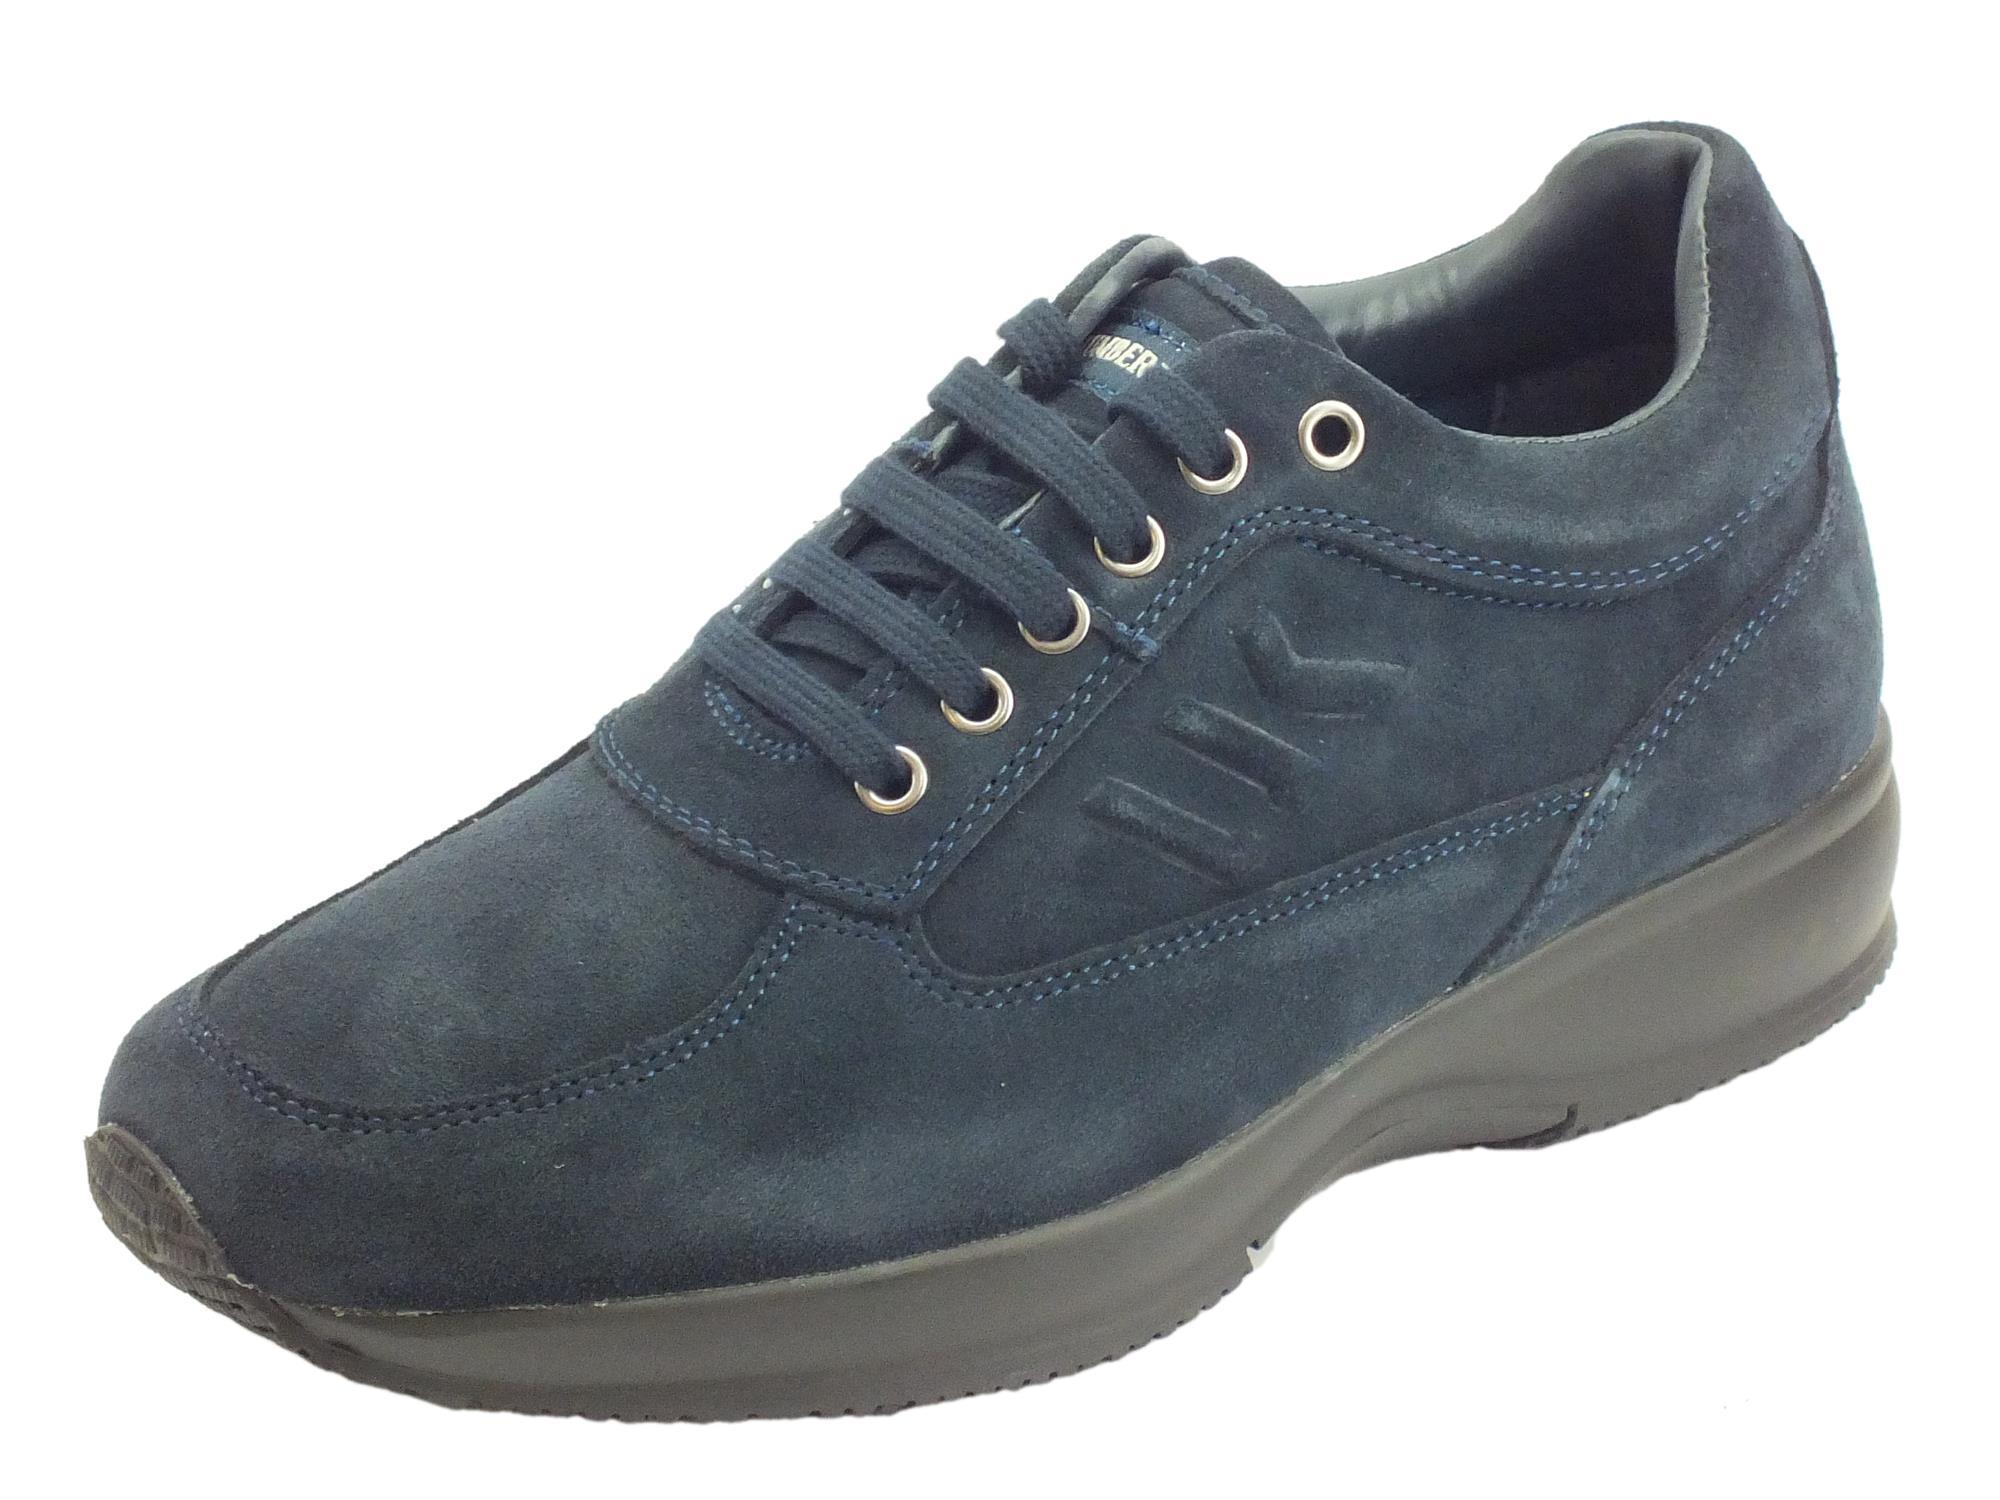 negozio online a789a 54975 Lumberjack Raul SM01305-007 A01 CC001 Navy Blue Scarpe Uomo ...